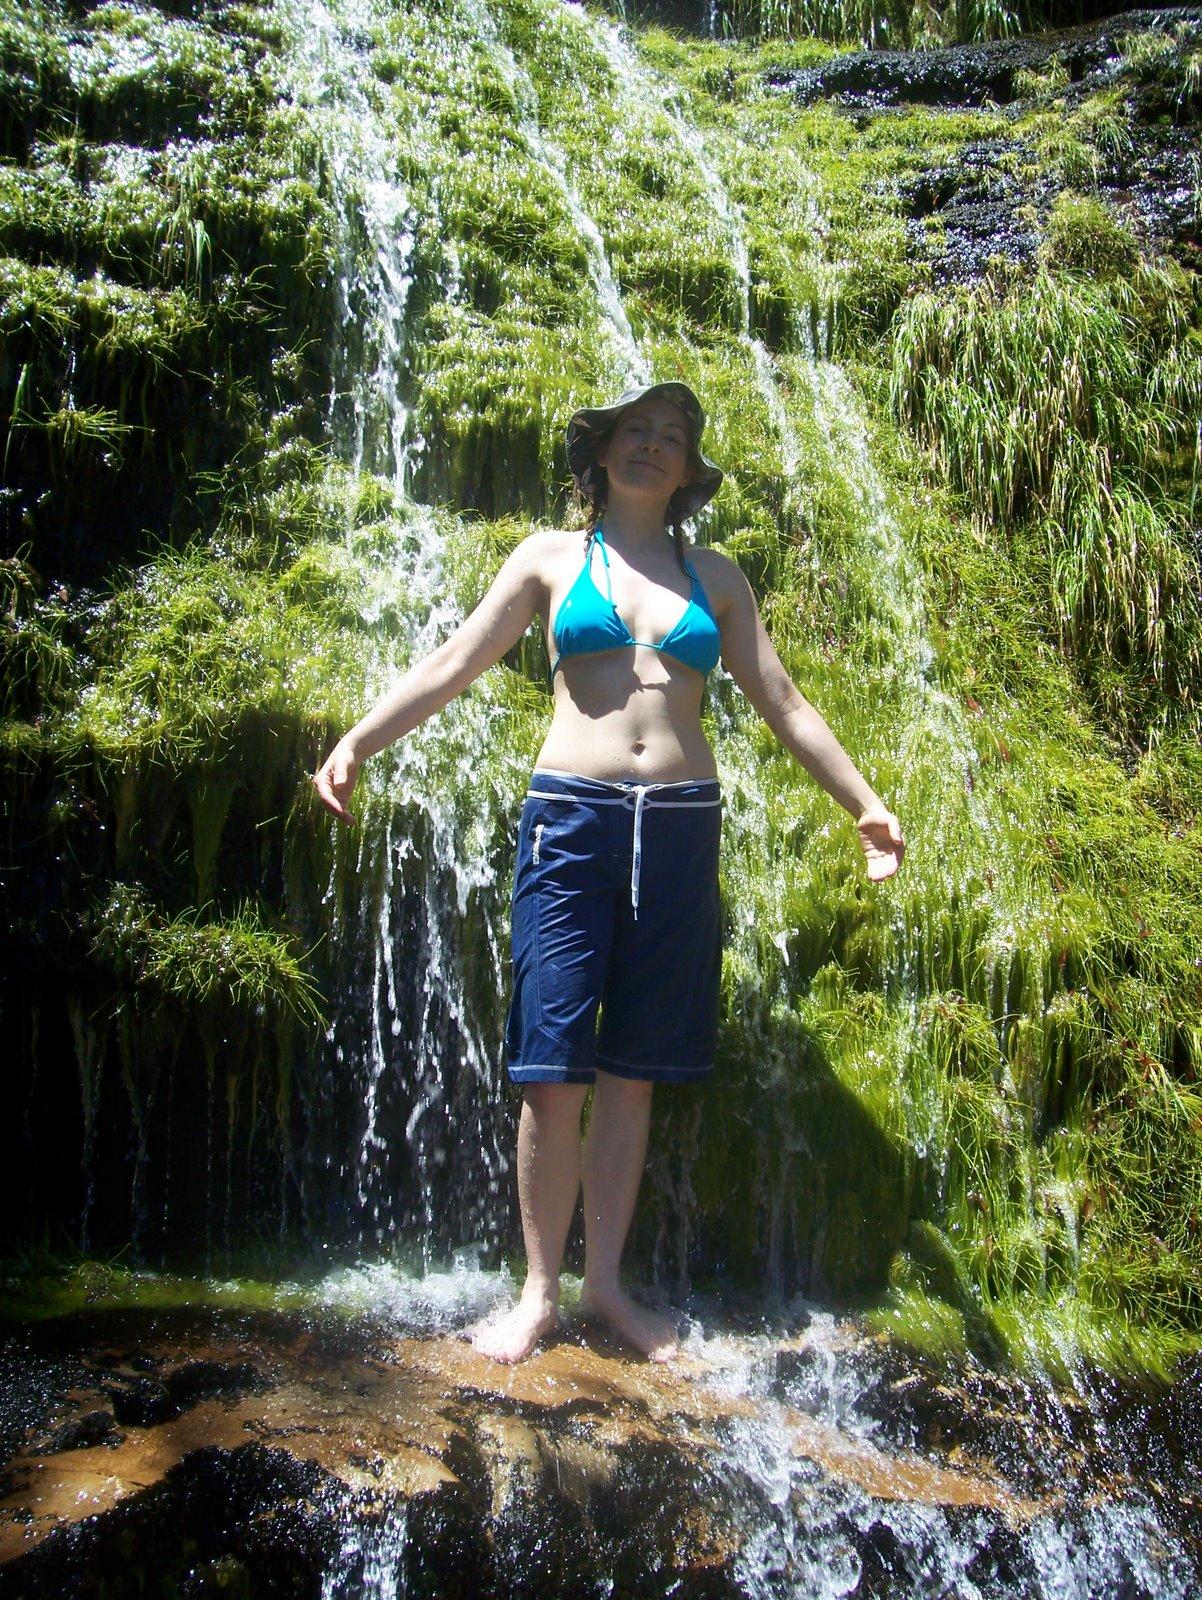 [waterfall]